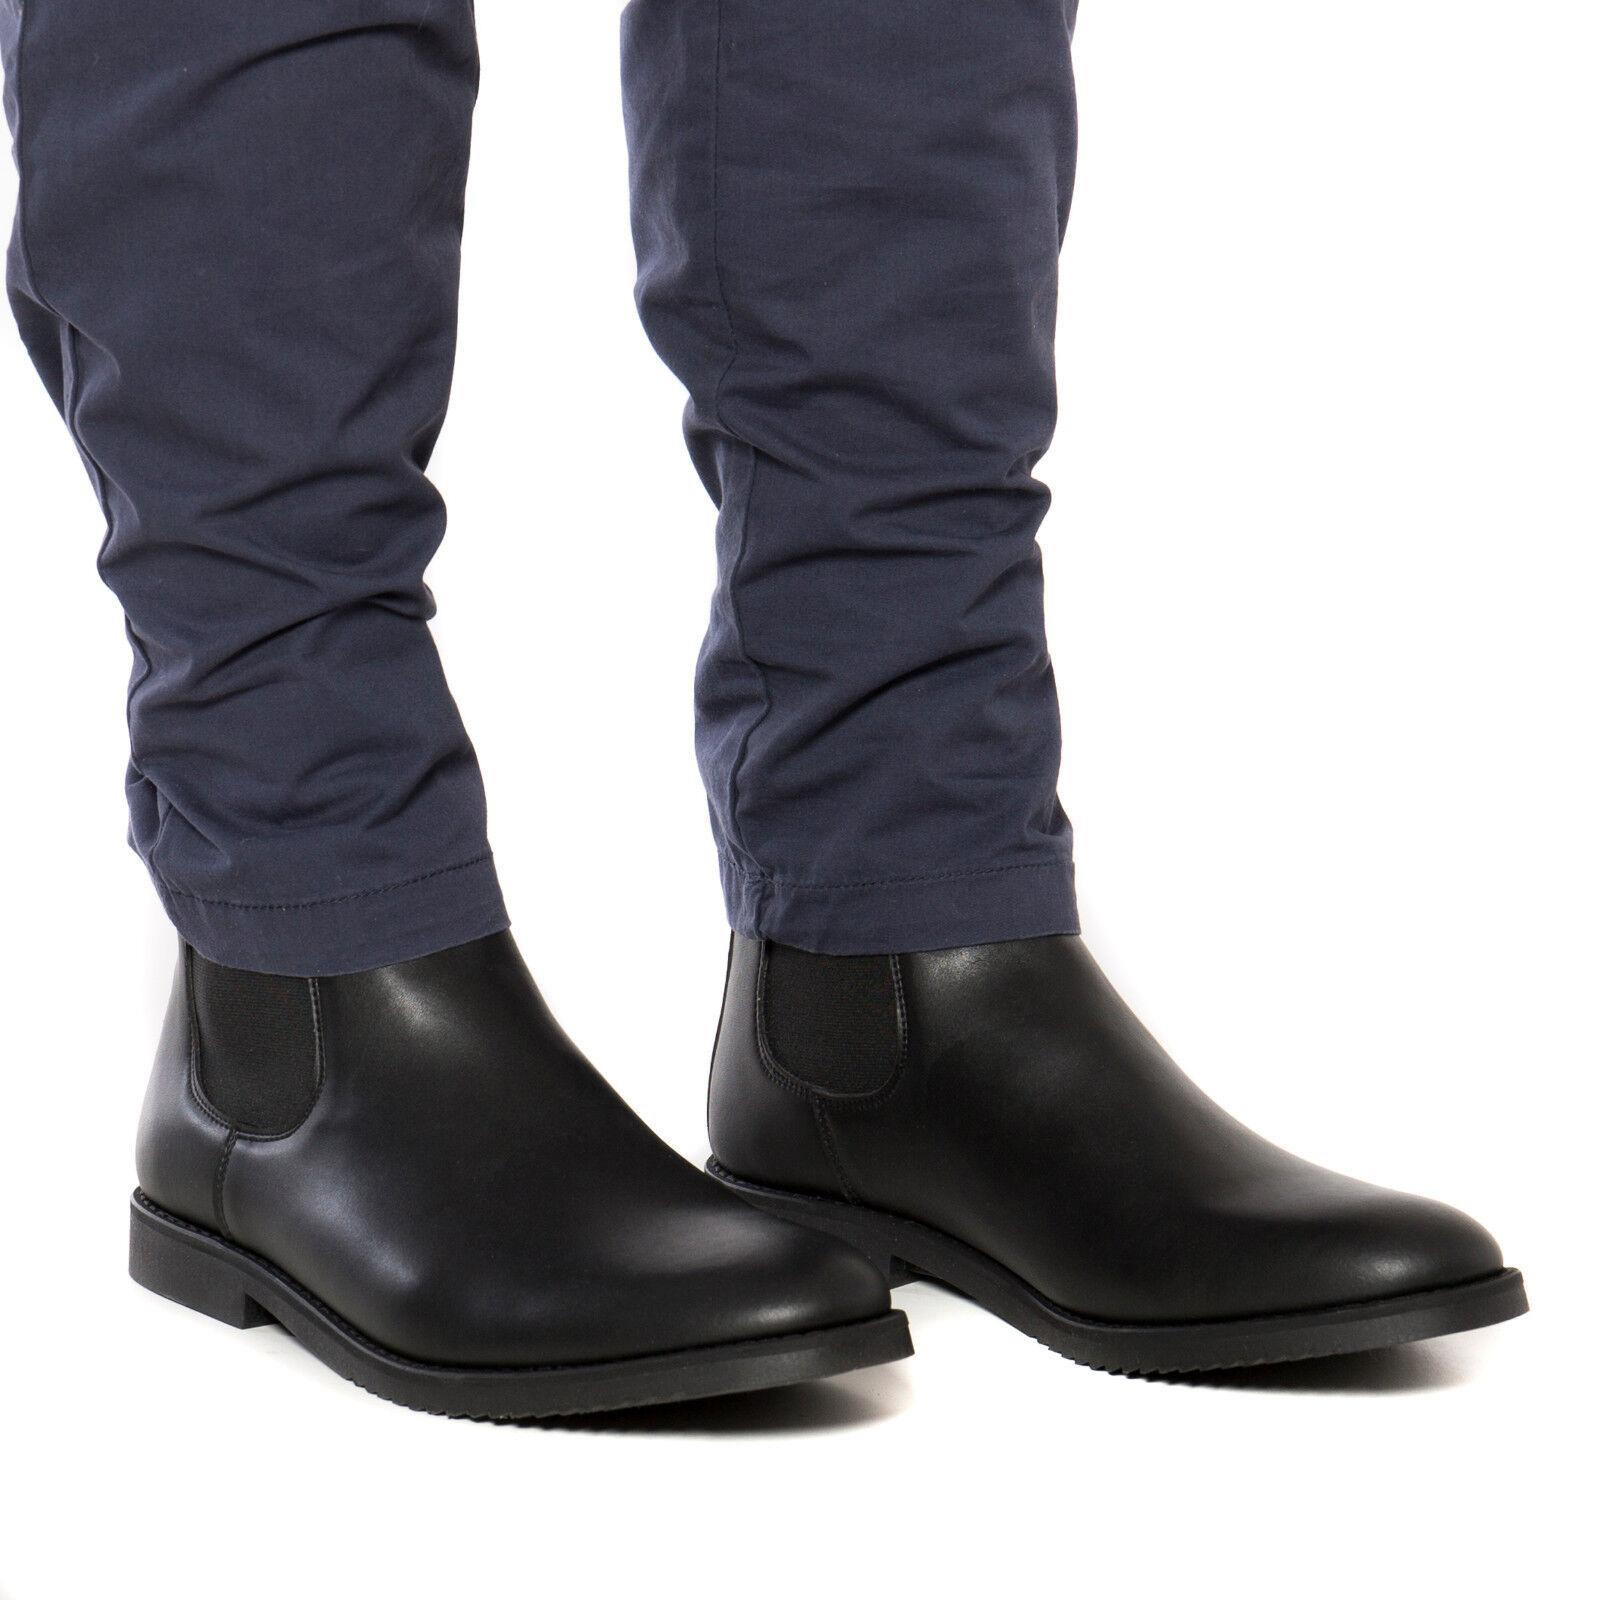 Chelsea Vegano Botas para hombre hecho en en en negro microfibra ecológico 9f38e8